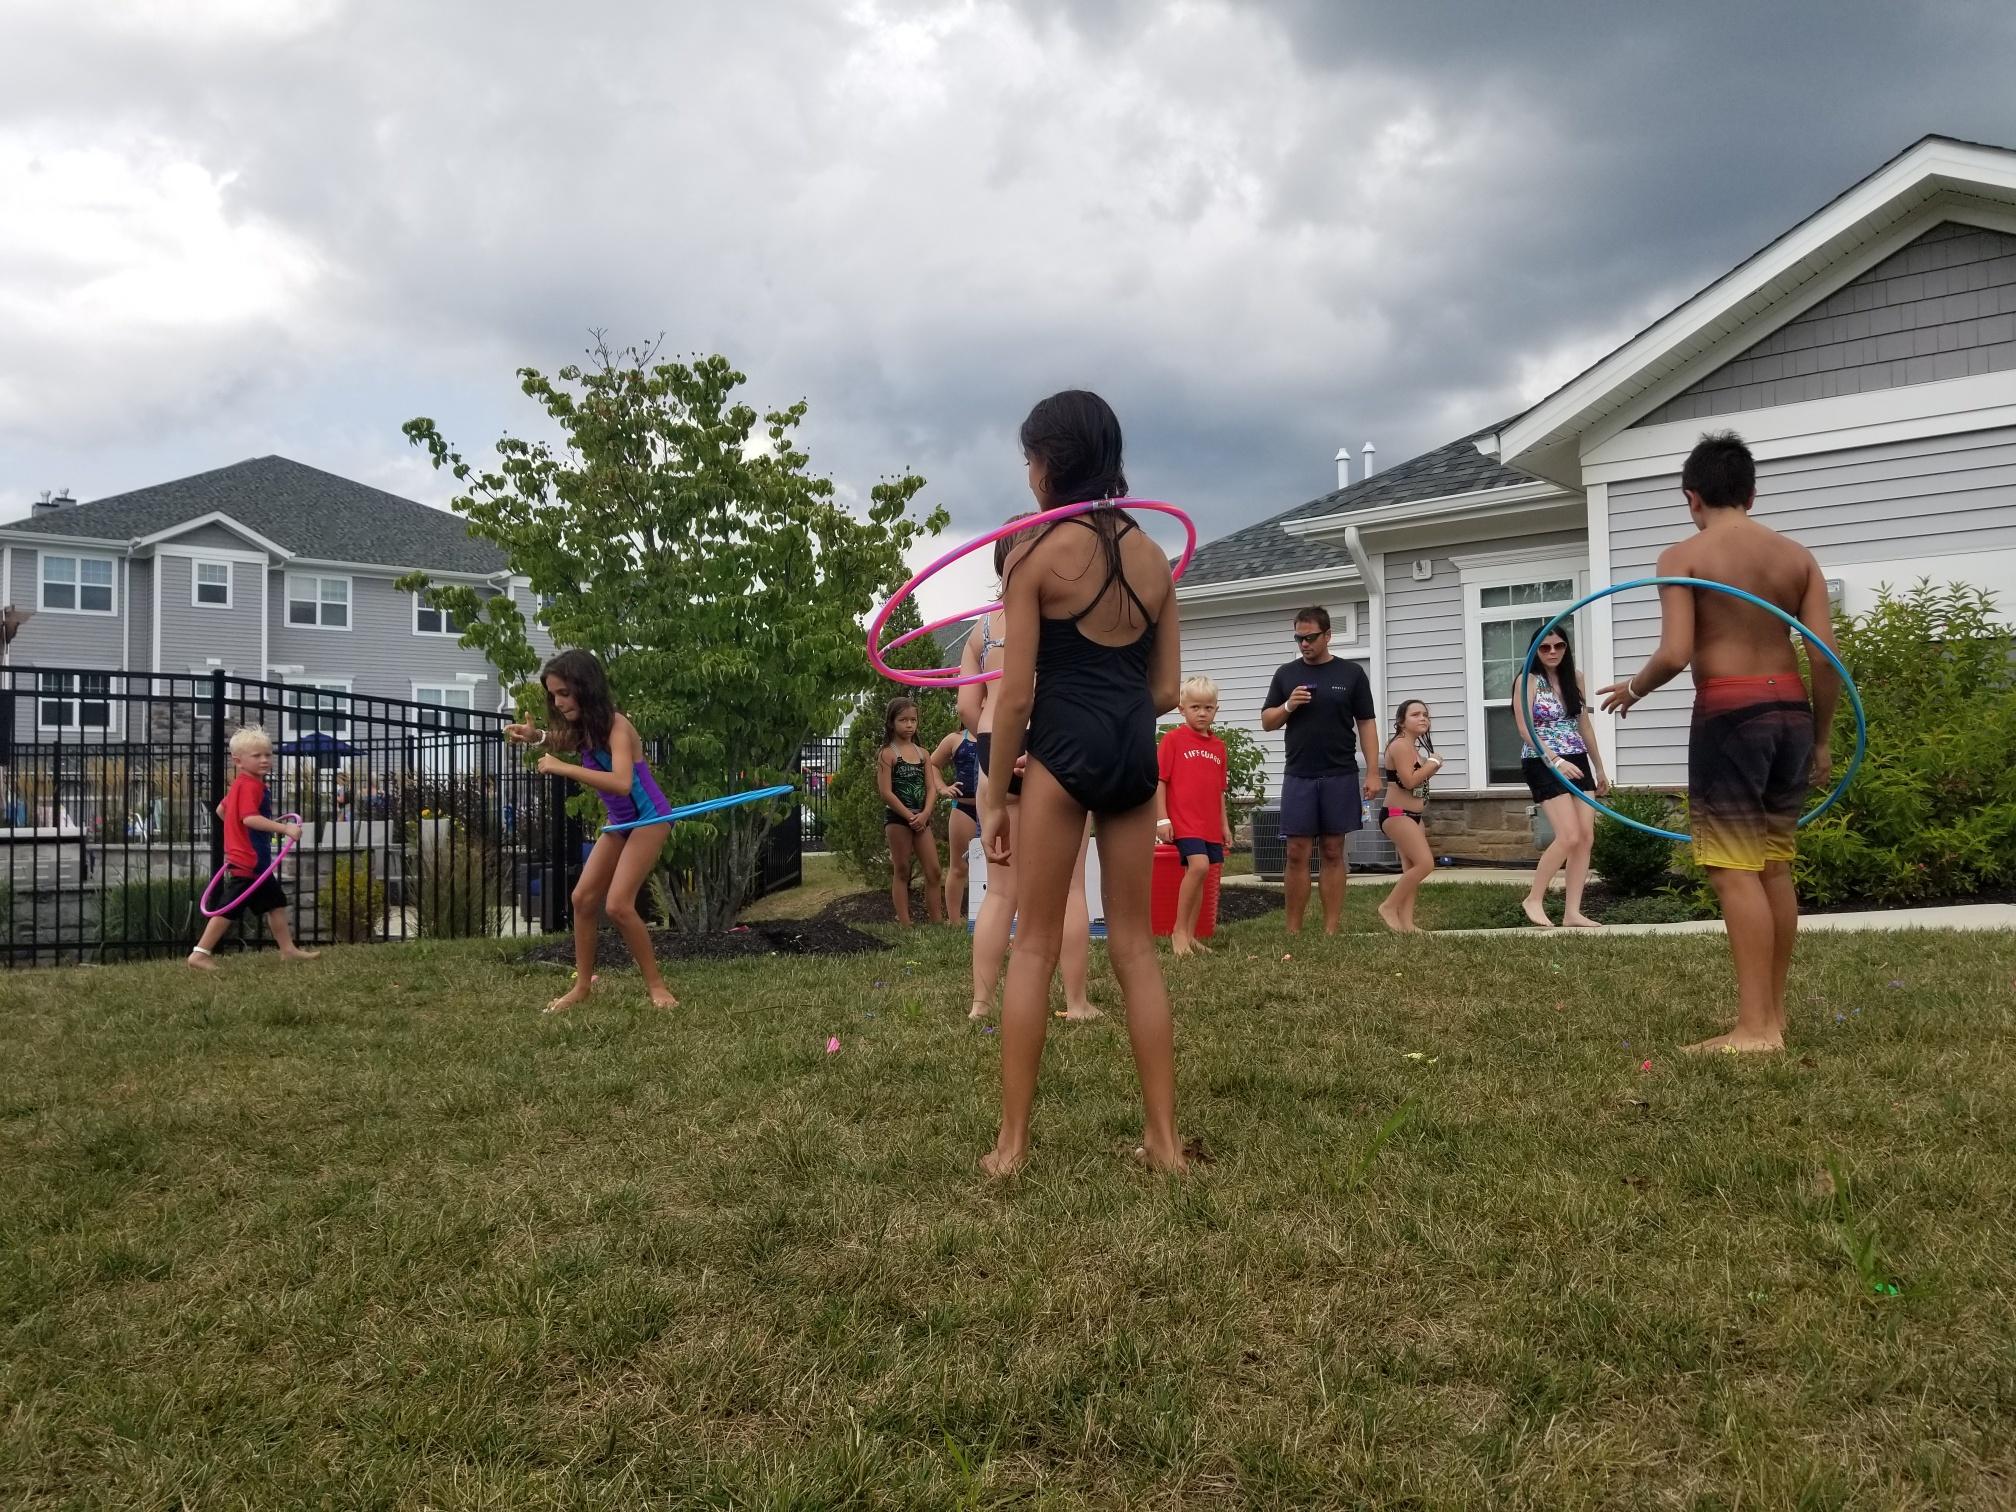 2019 Avanti Apartments Pool Party - Hula Hoop Contest